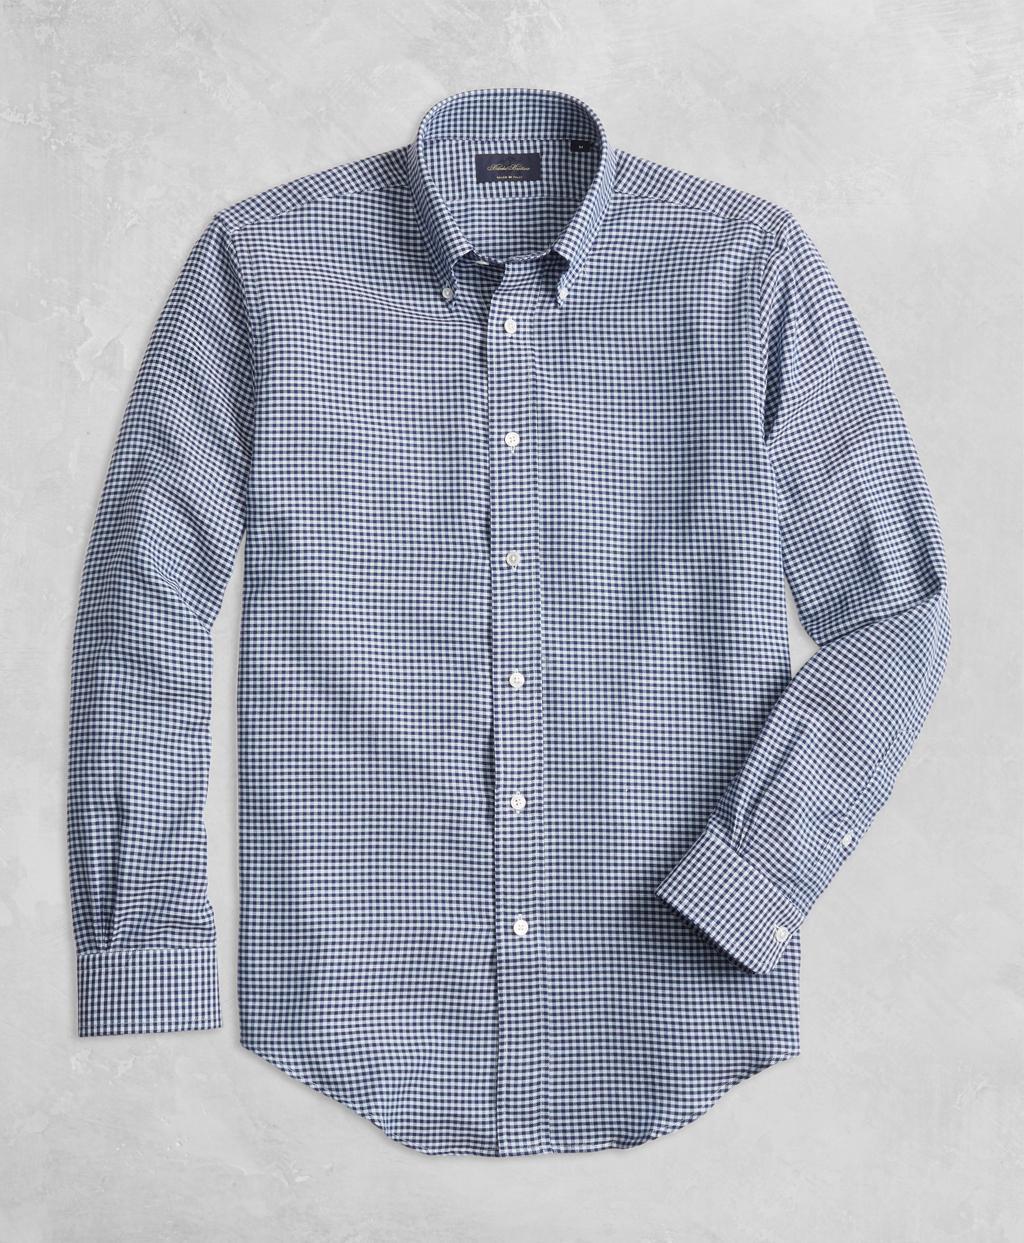 005c5c832b2 Brooks Brothers. Men's Blue Golden Fleece Regent Fit Gingham Sport Shirt